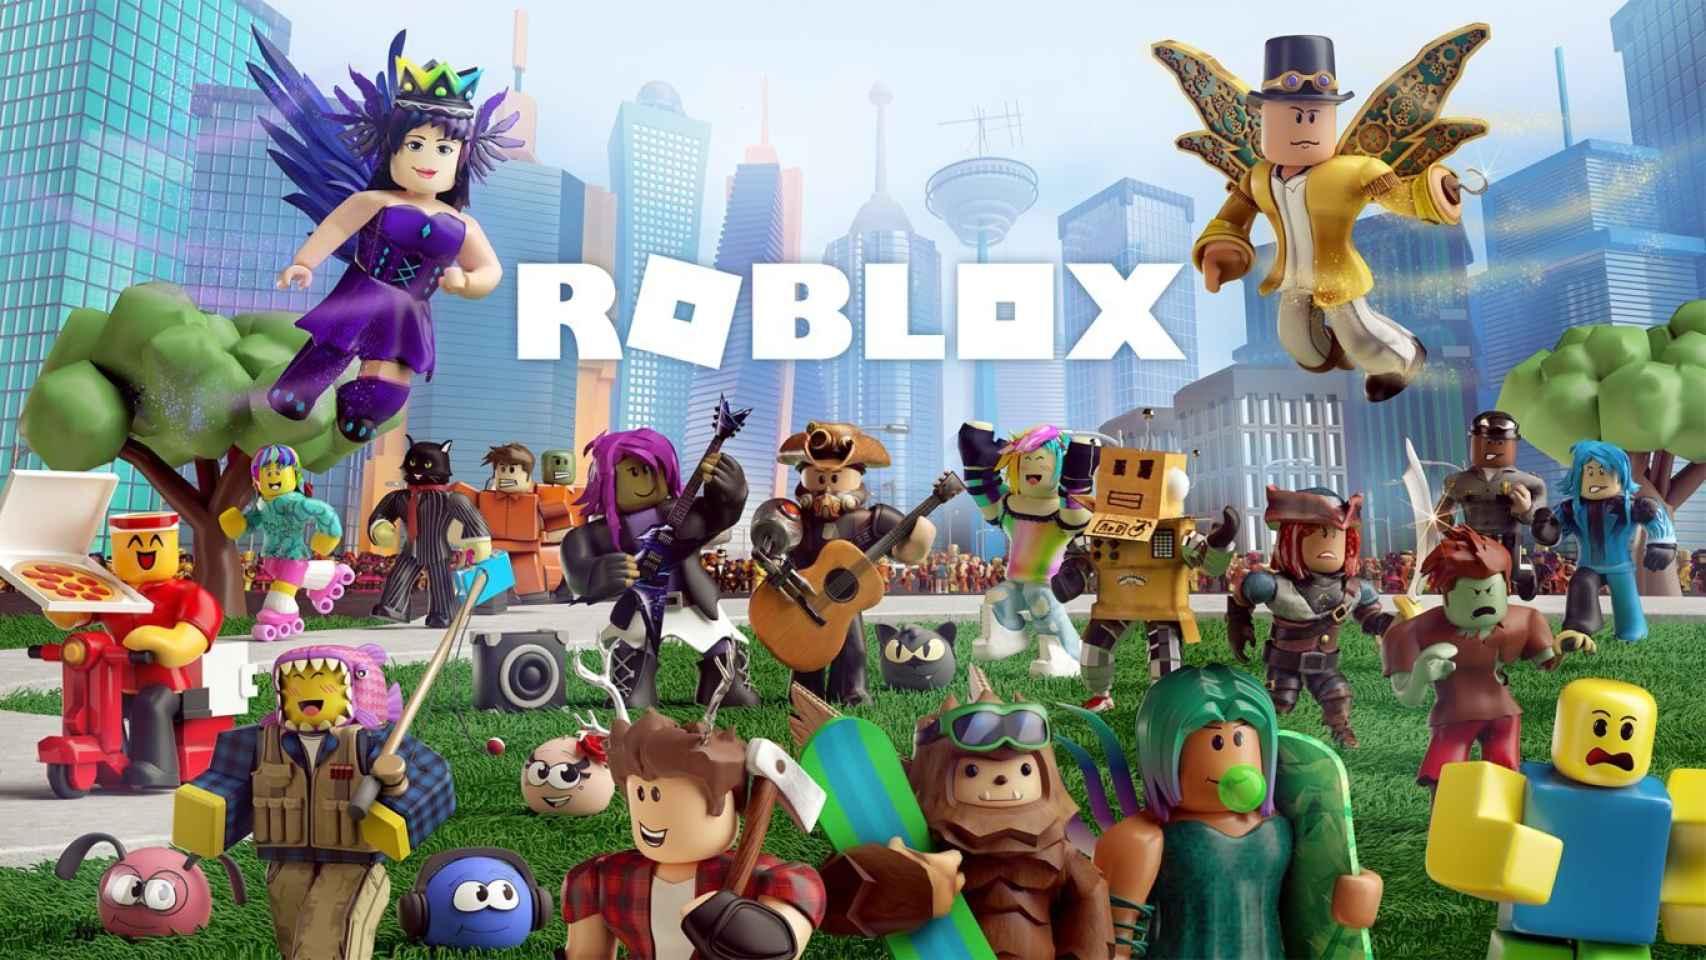 Una imagen del universo Roblox.